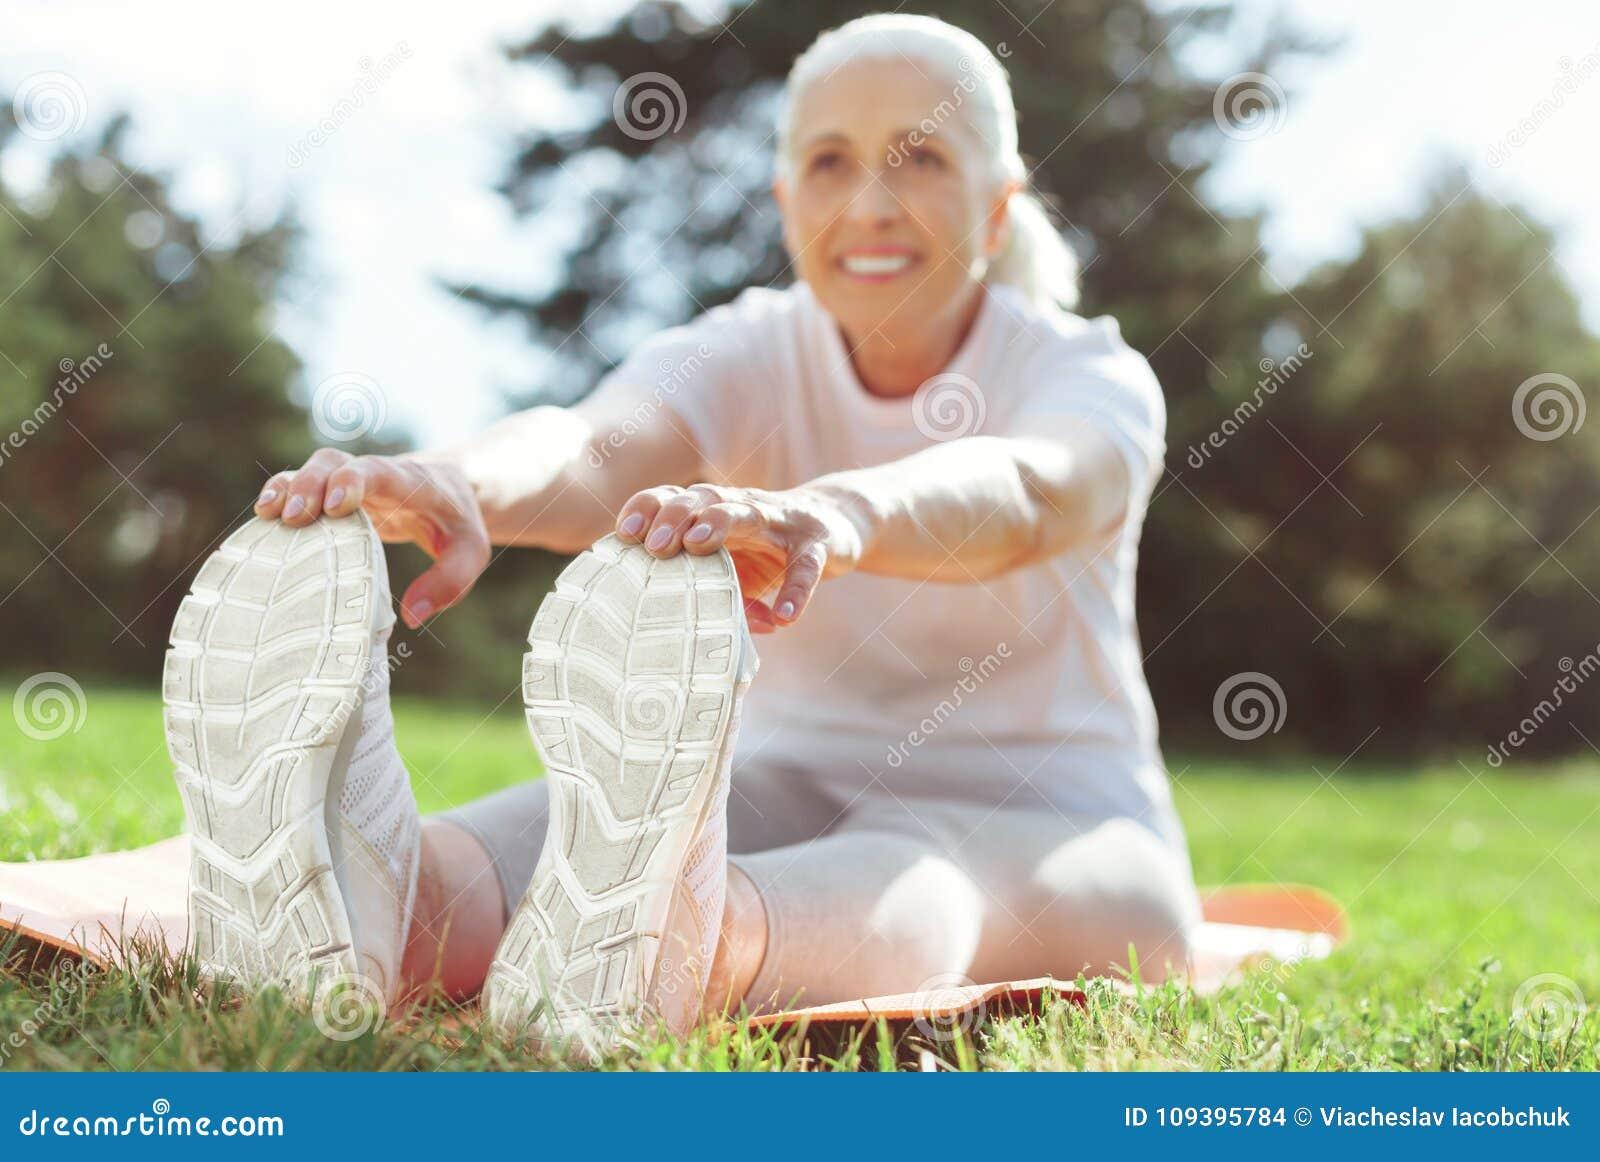 Enjoying with the mature feet